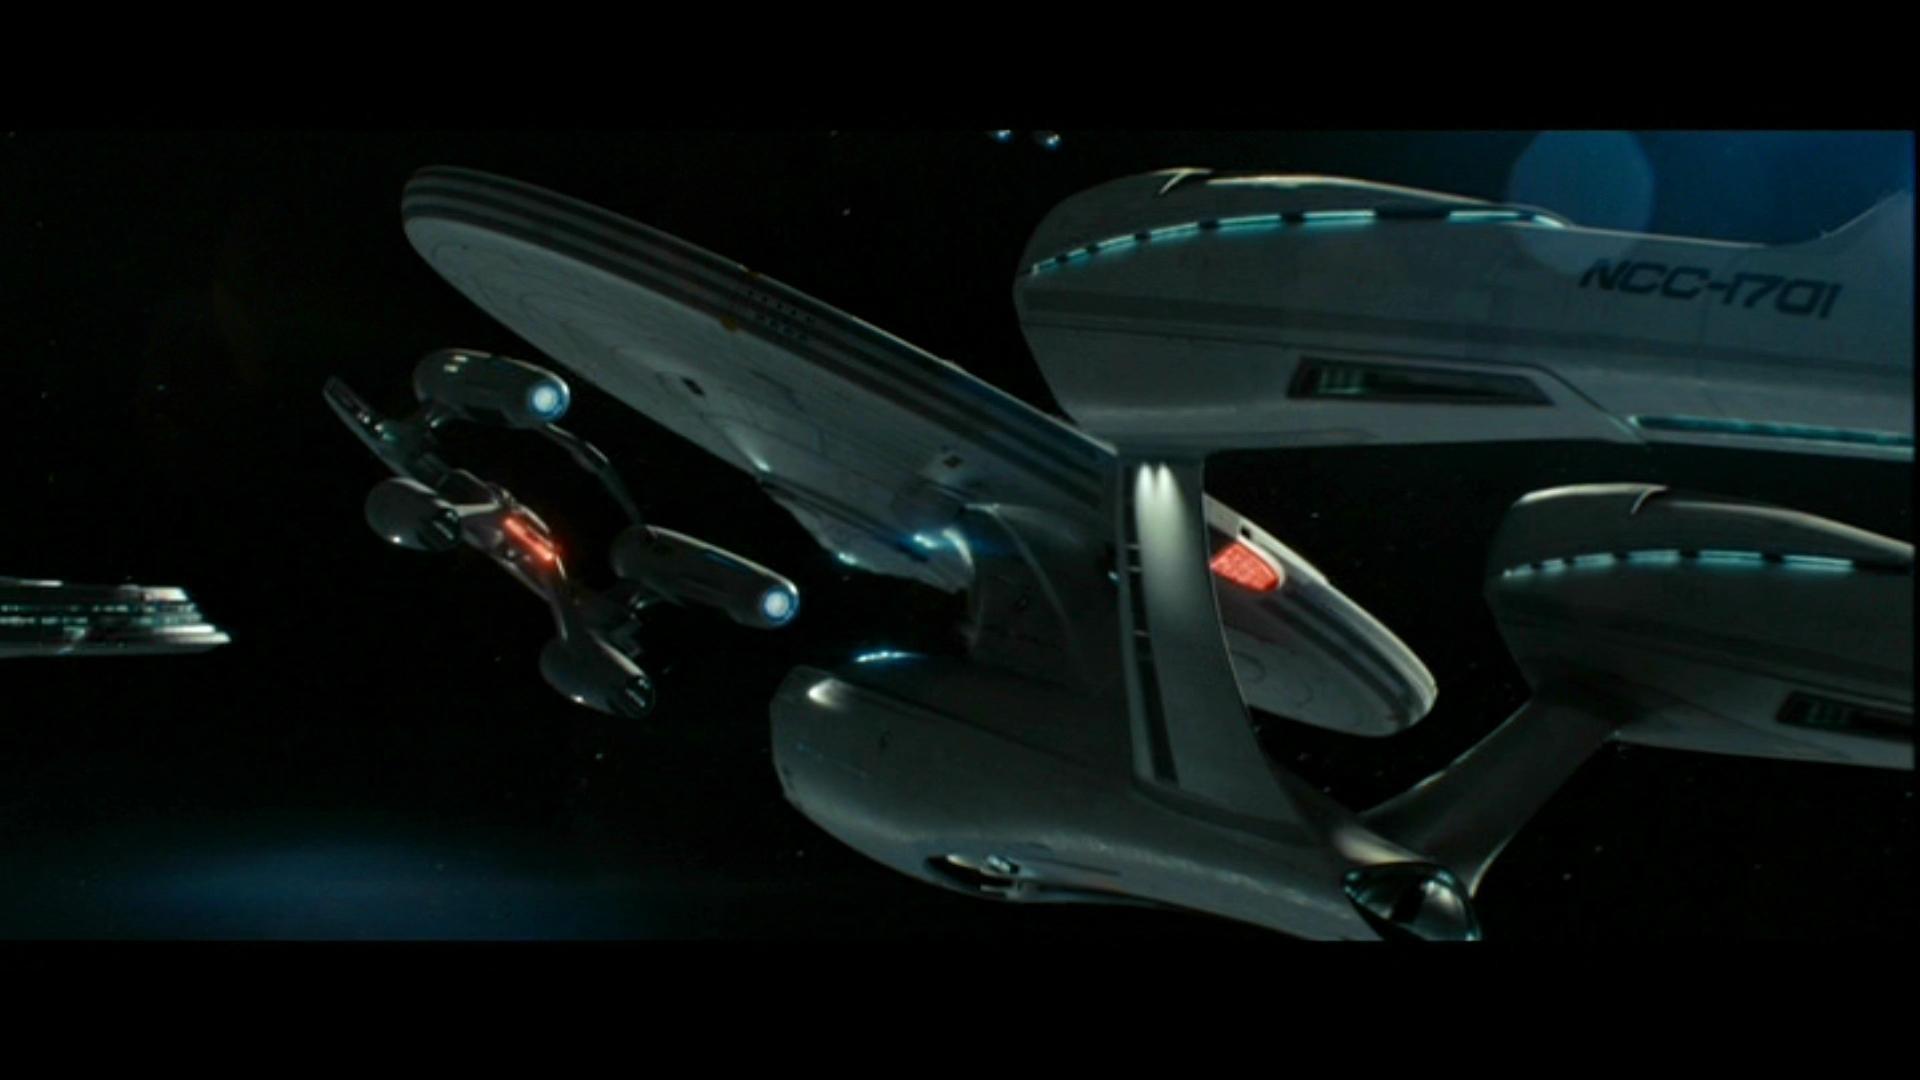 Star Trek hd desktop